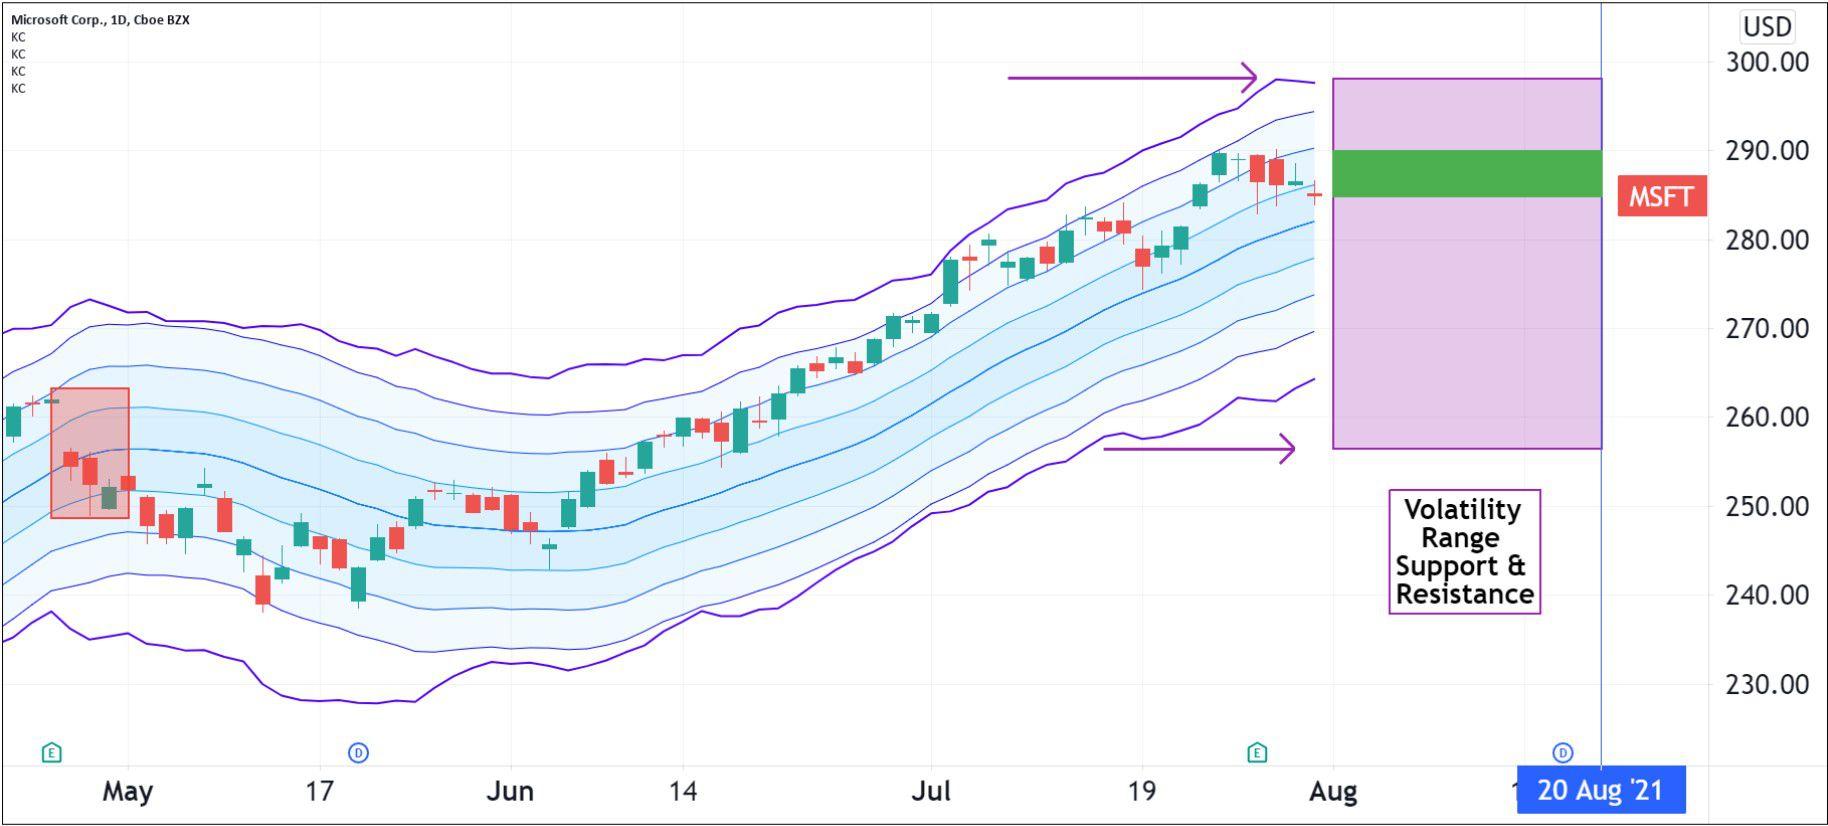 Volatility pattern for Microsoft Corporation (MSFT)